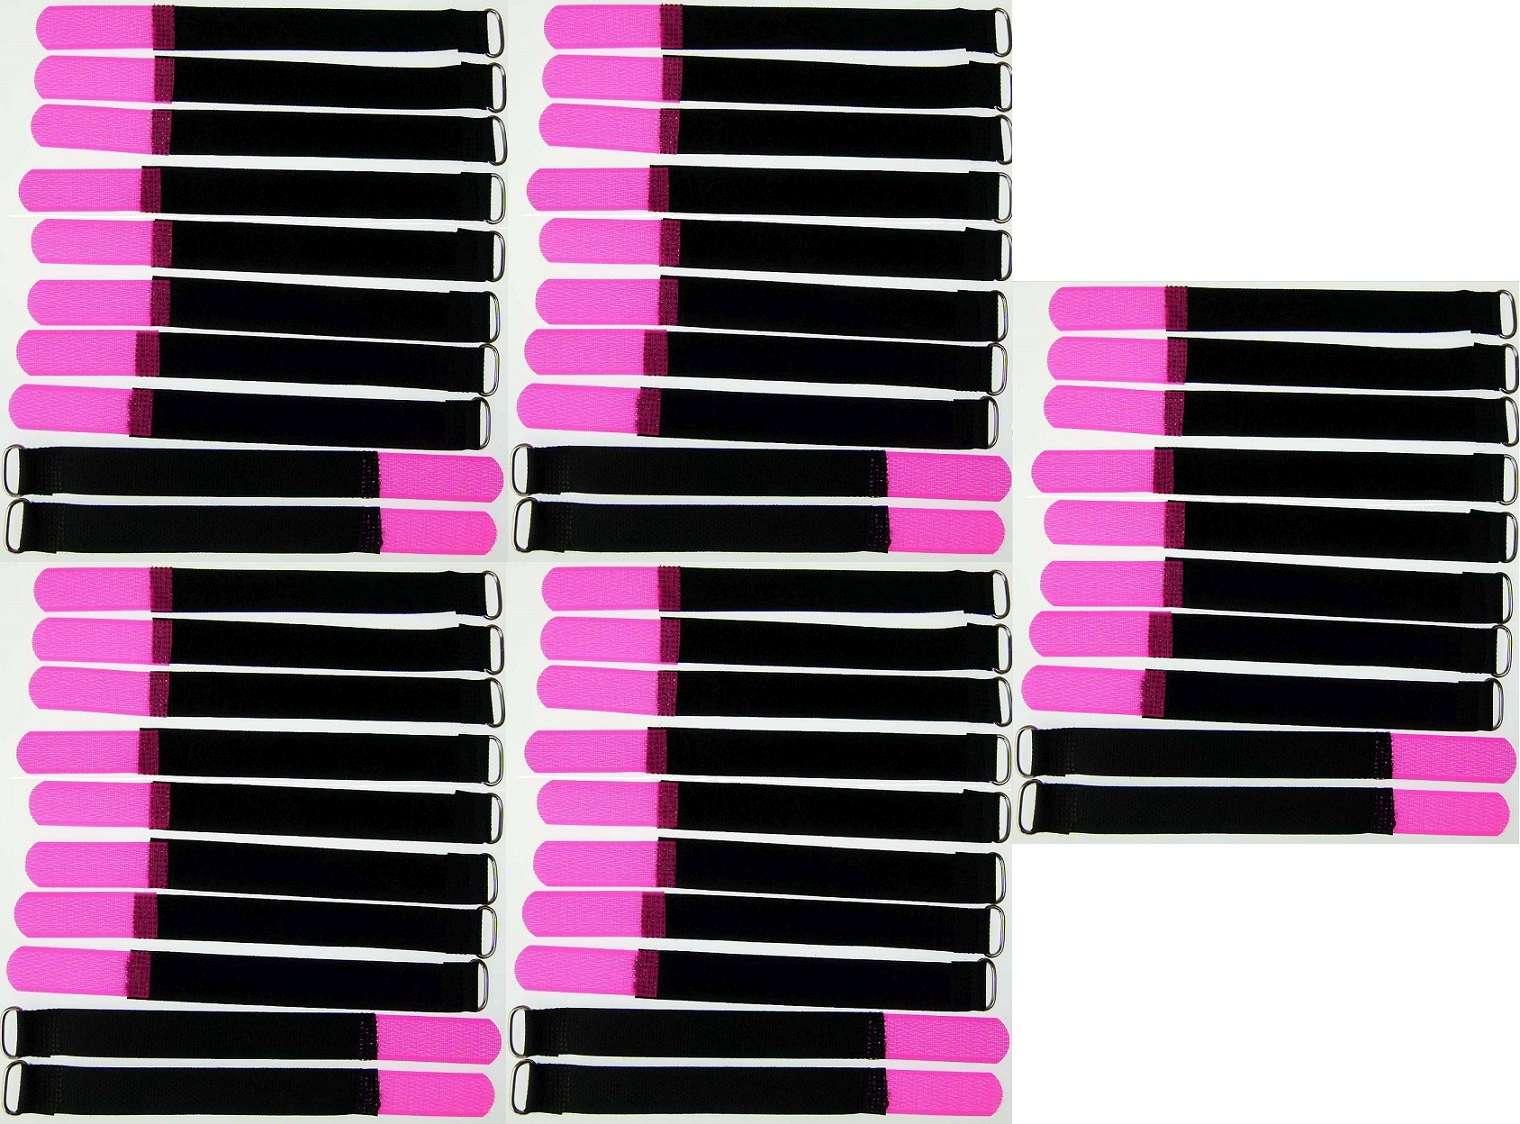 10 Kabelbinder Kabelklett 50 cm x 50 mm neon pink Klettband Klettkabelbinder Öse